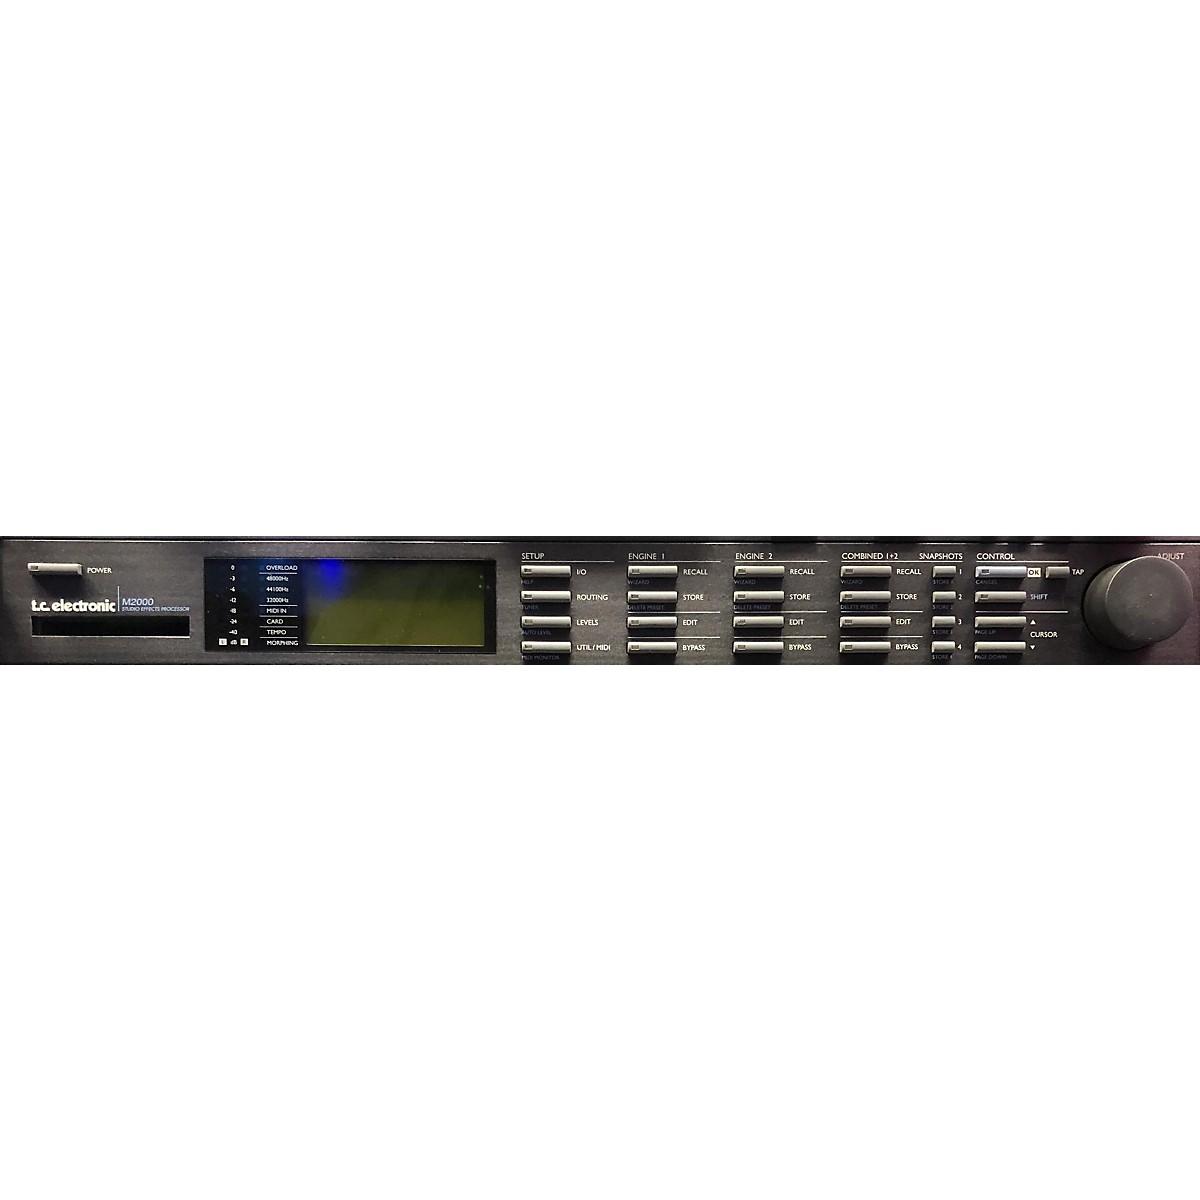 TC Electronic M2000 Multi Effects Processor